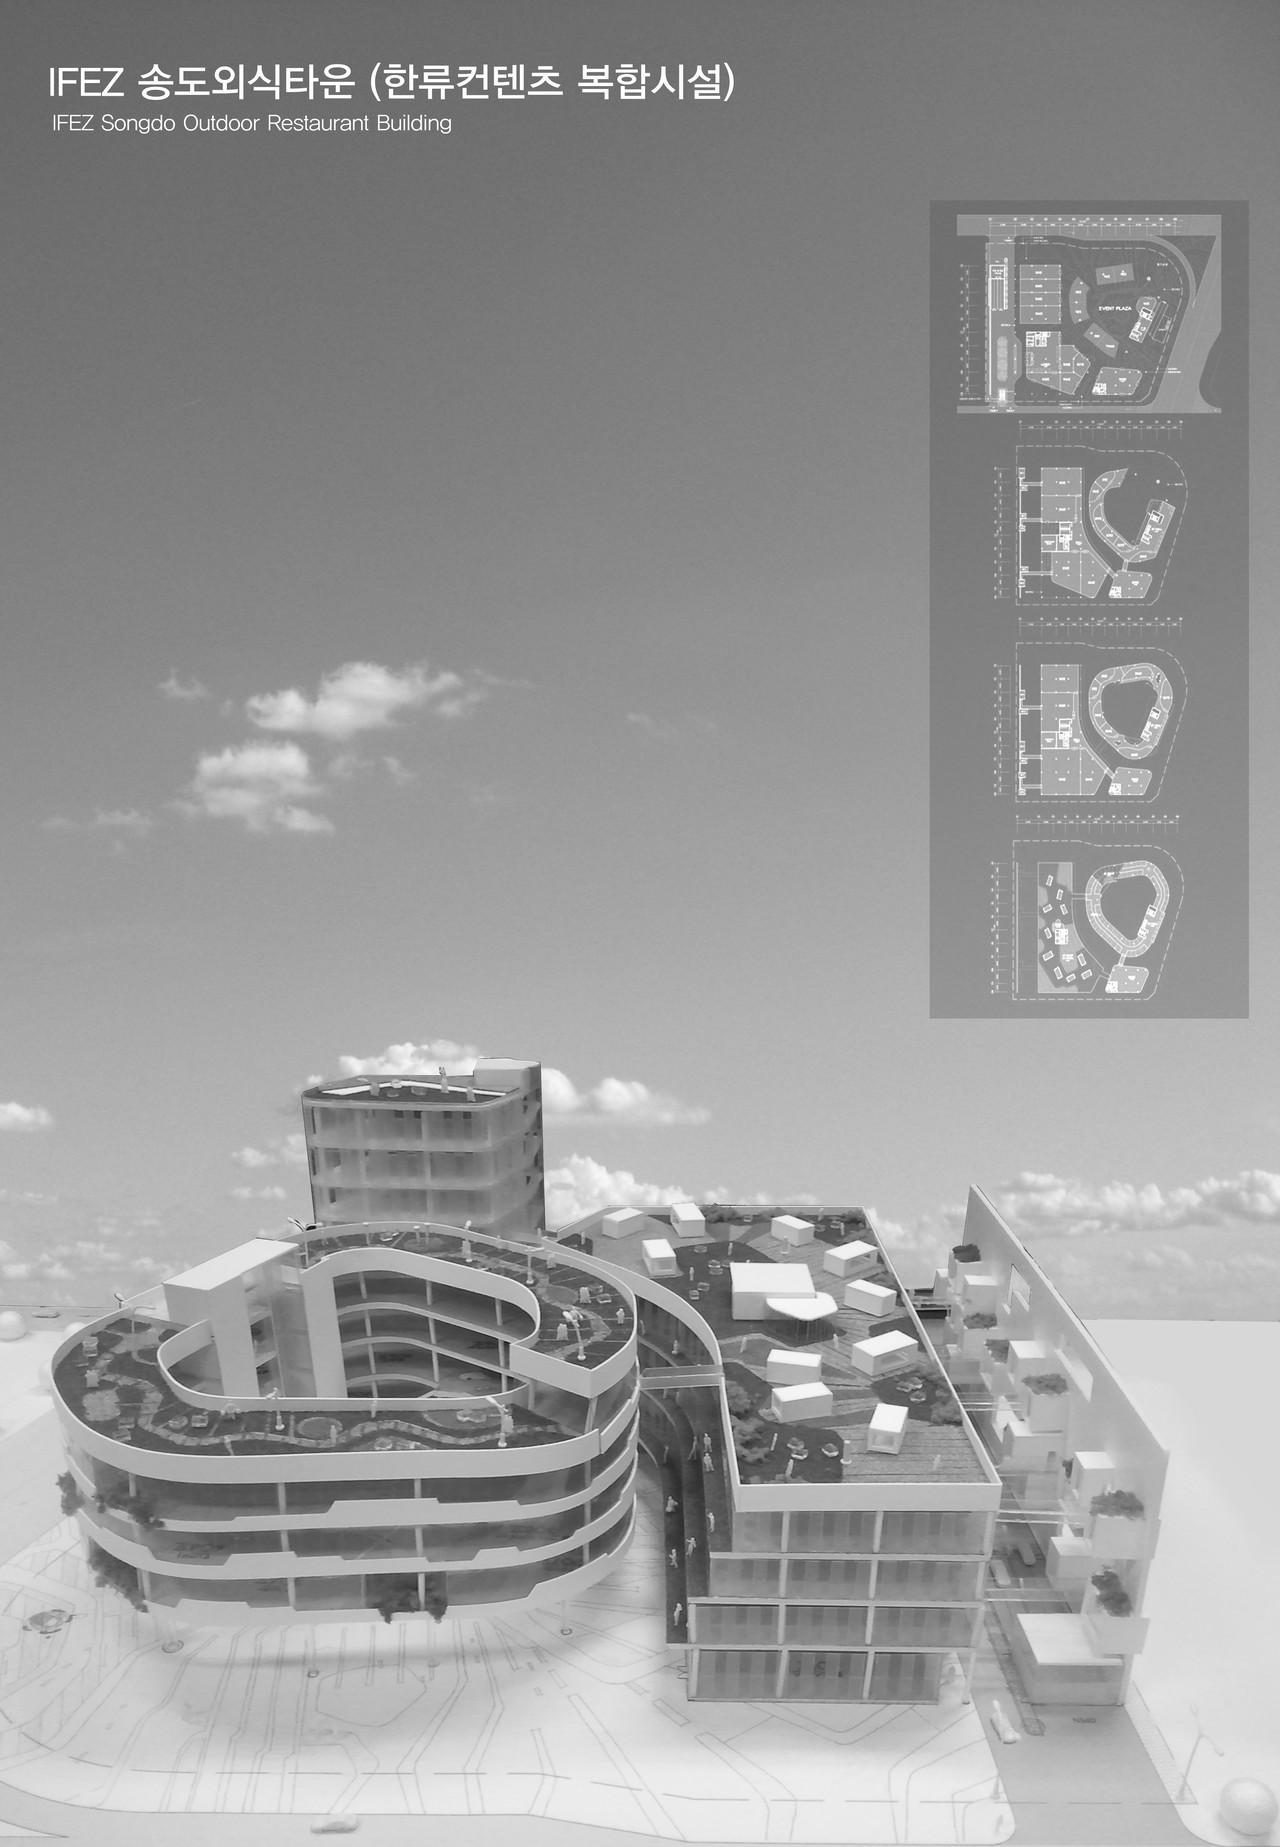 IFEZ(인천경제자유구역청)송도외식타운 개발사업 컨설팅